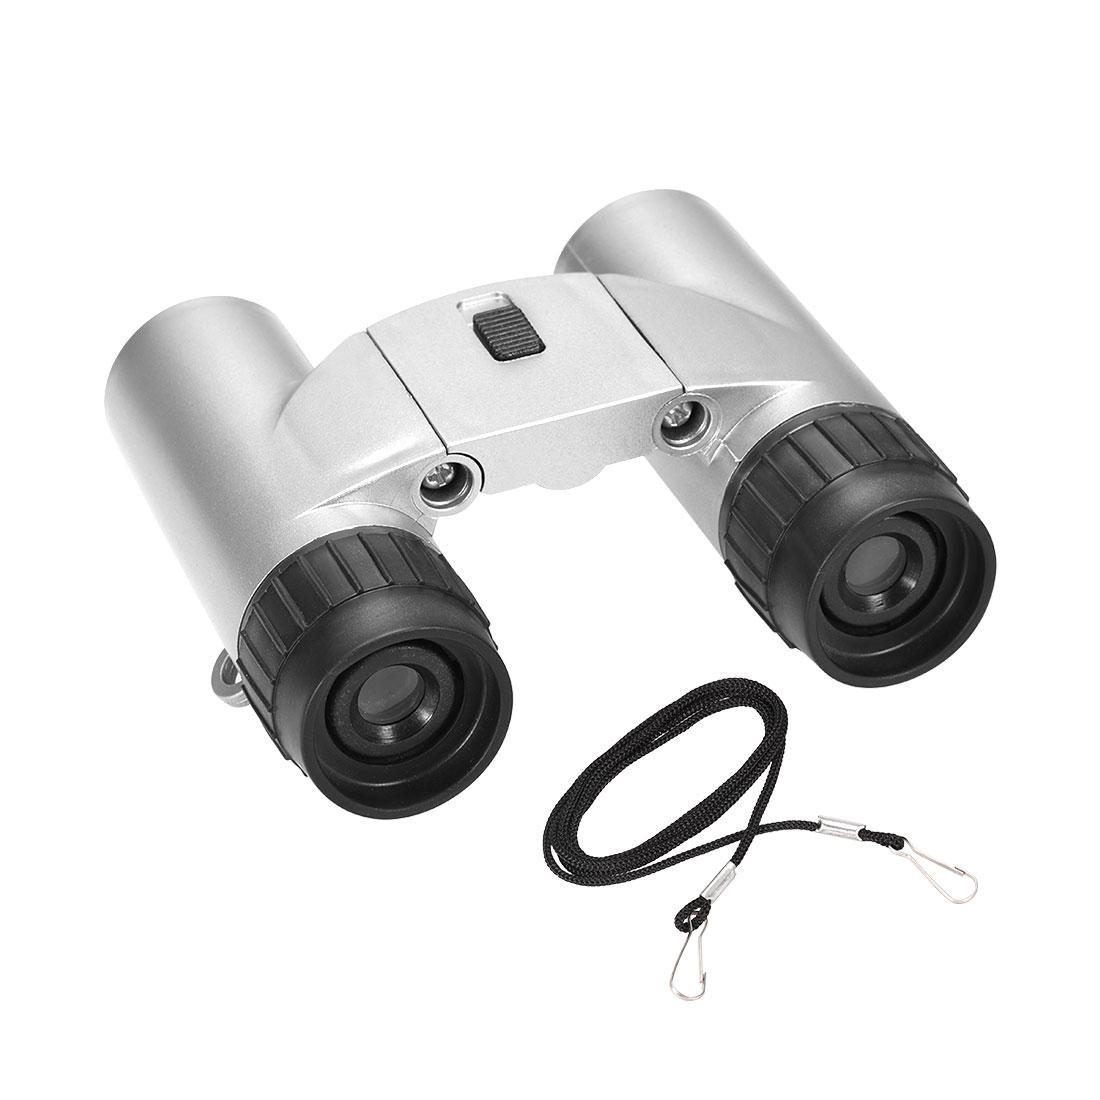 Toy Binoculars 7X30 Compact Foldable Binoculars Silver Tone with LED light